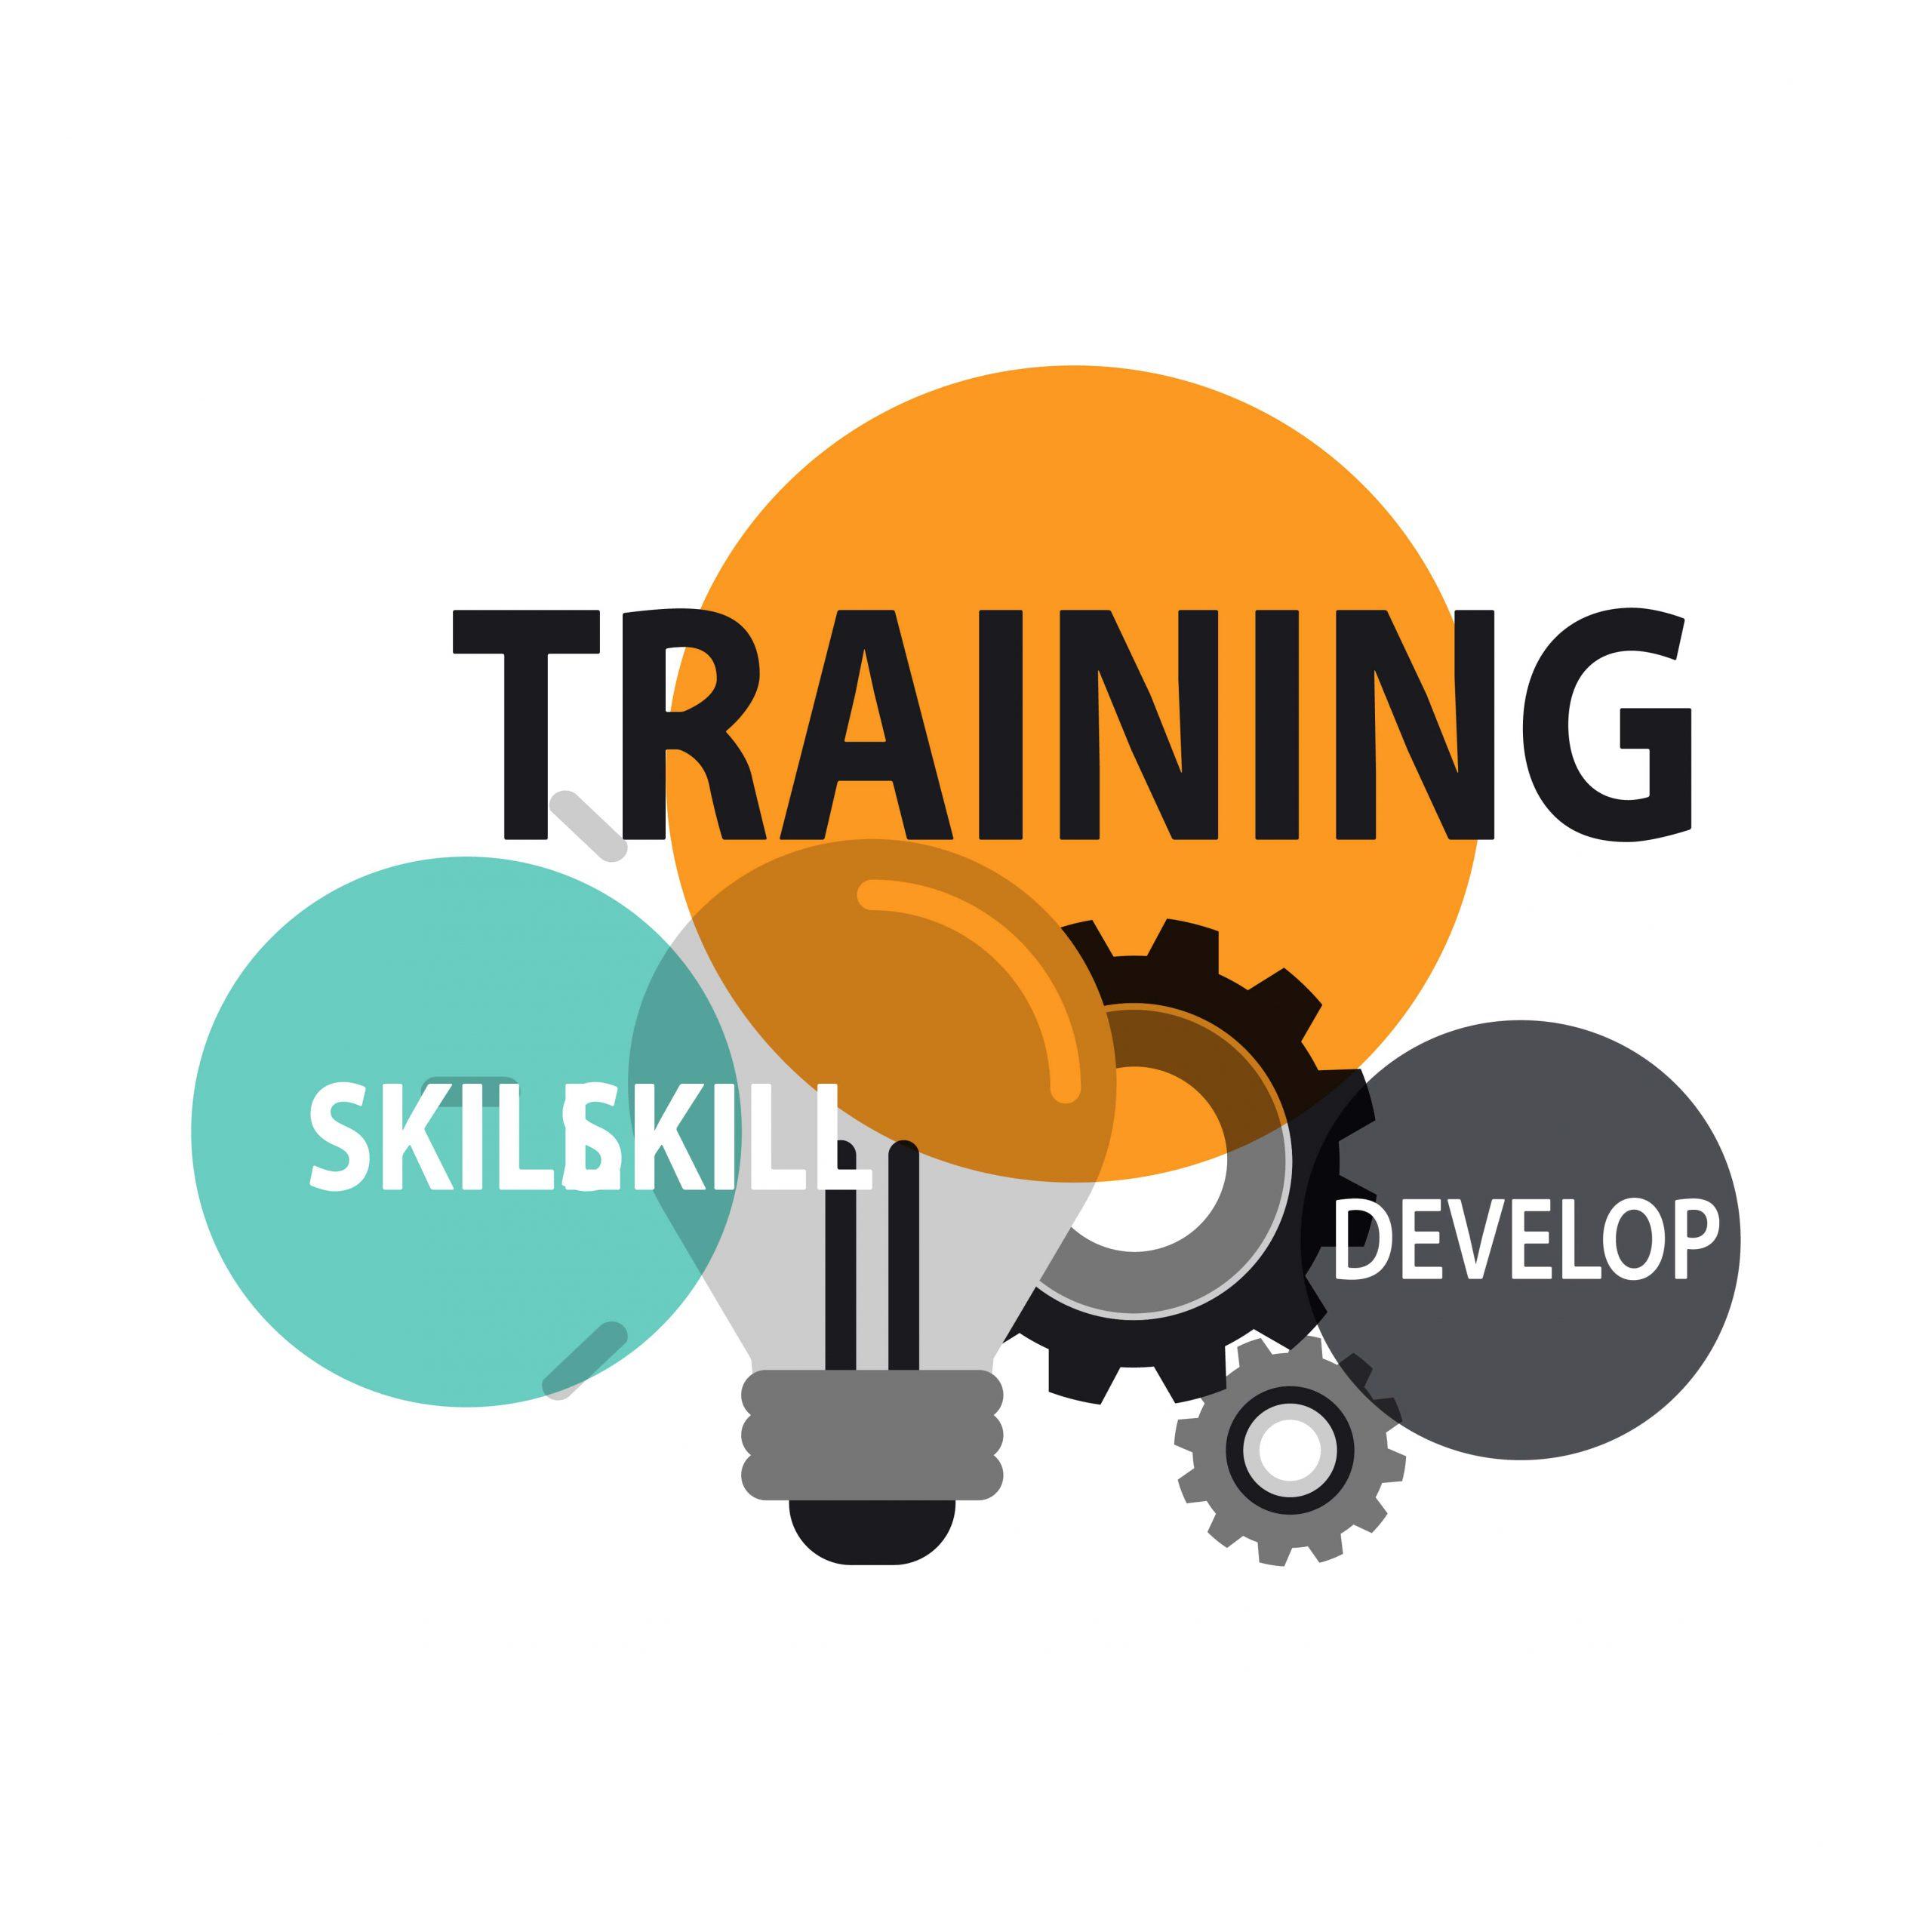 Skill gap analysis for career development plan